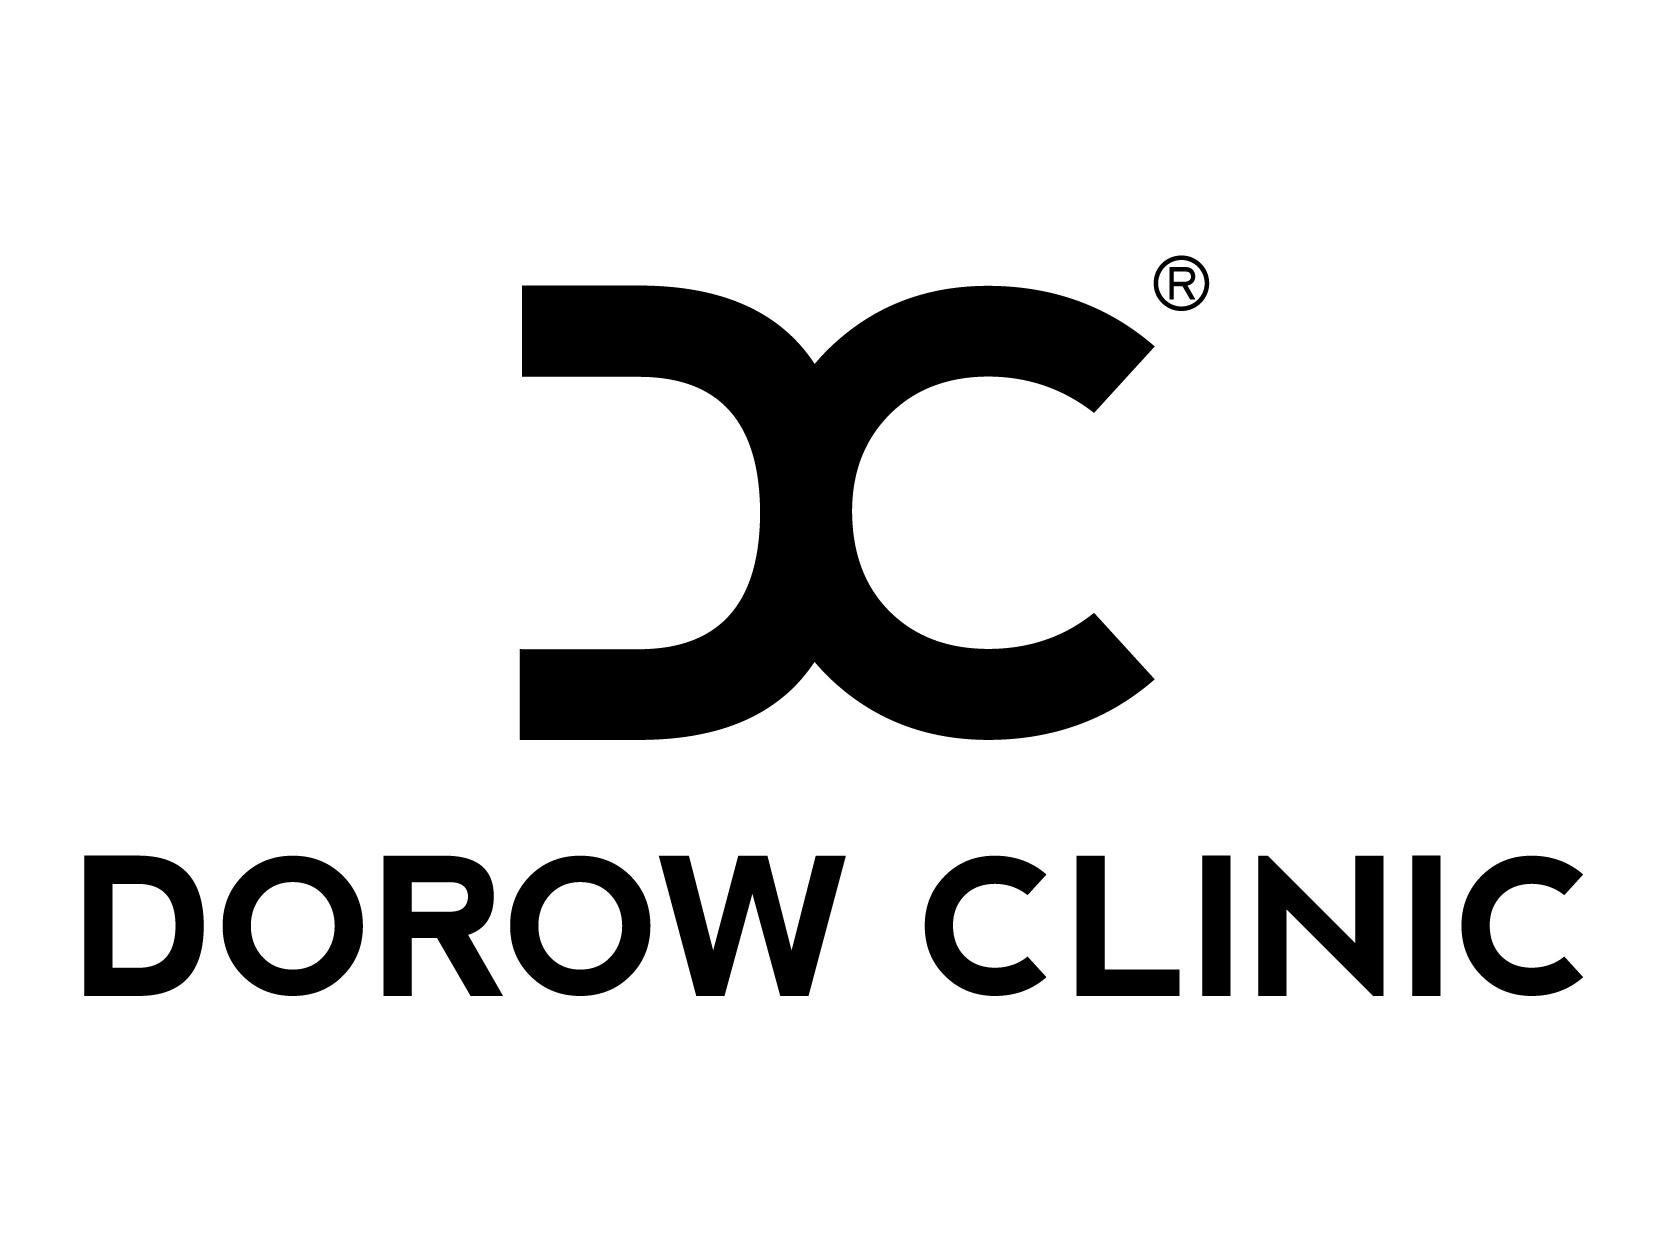 DC-DOROW-CLINIC-400x300